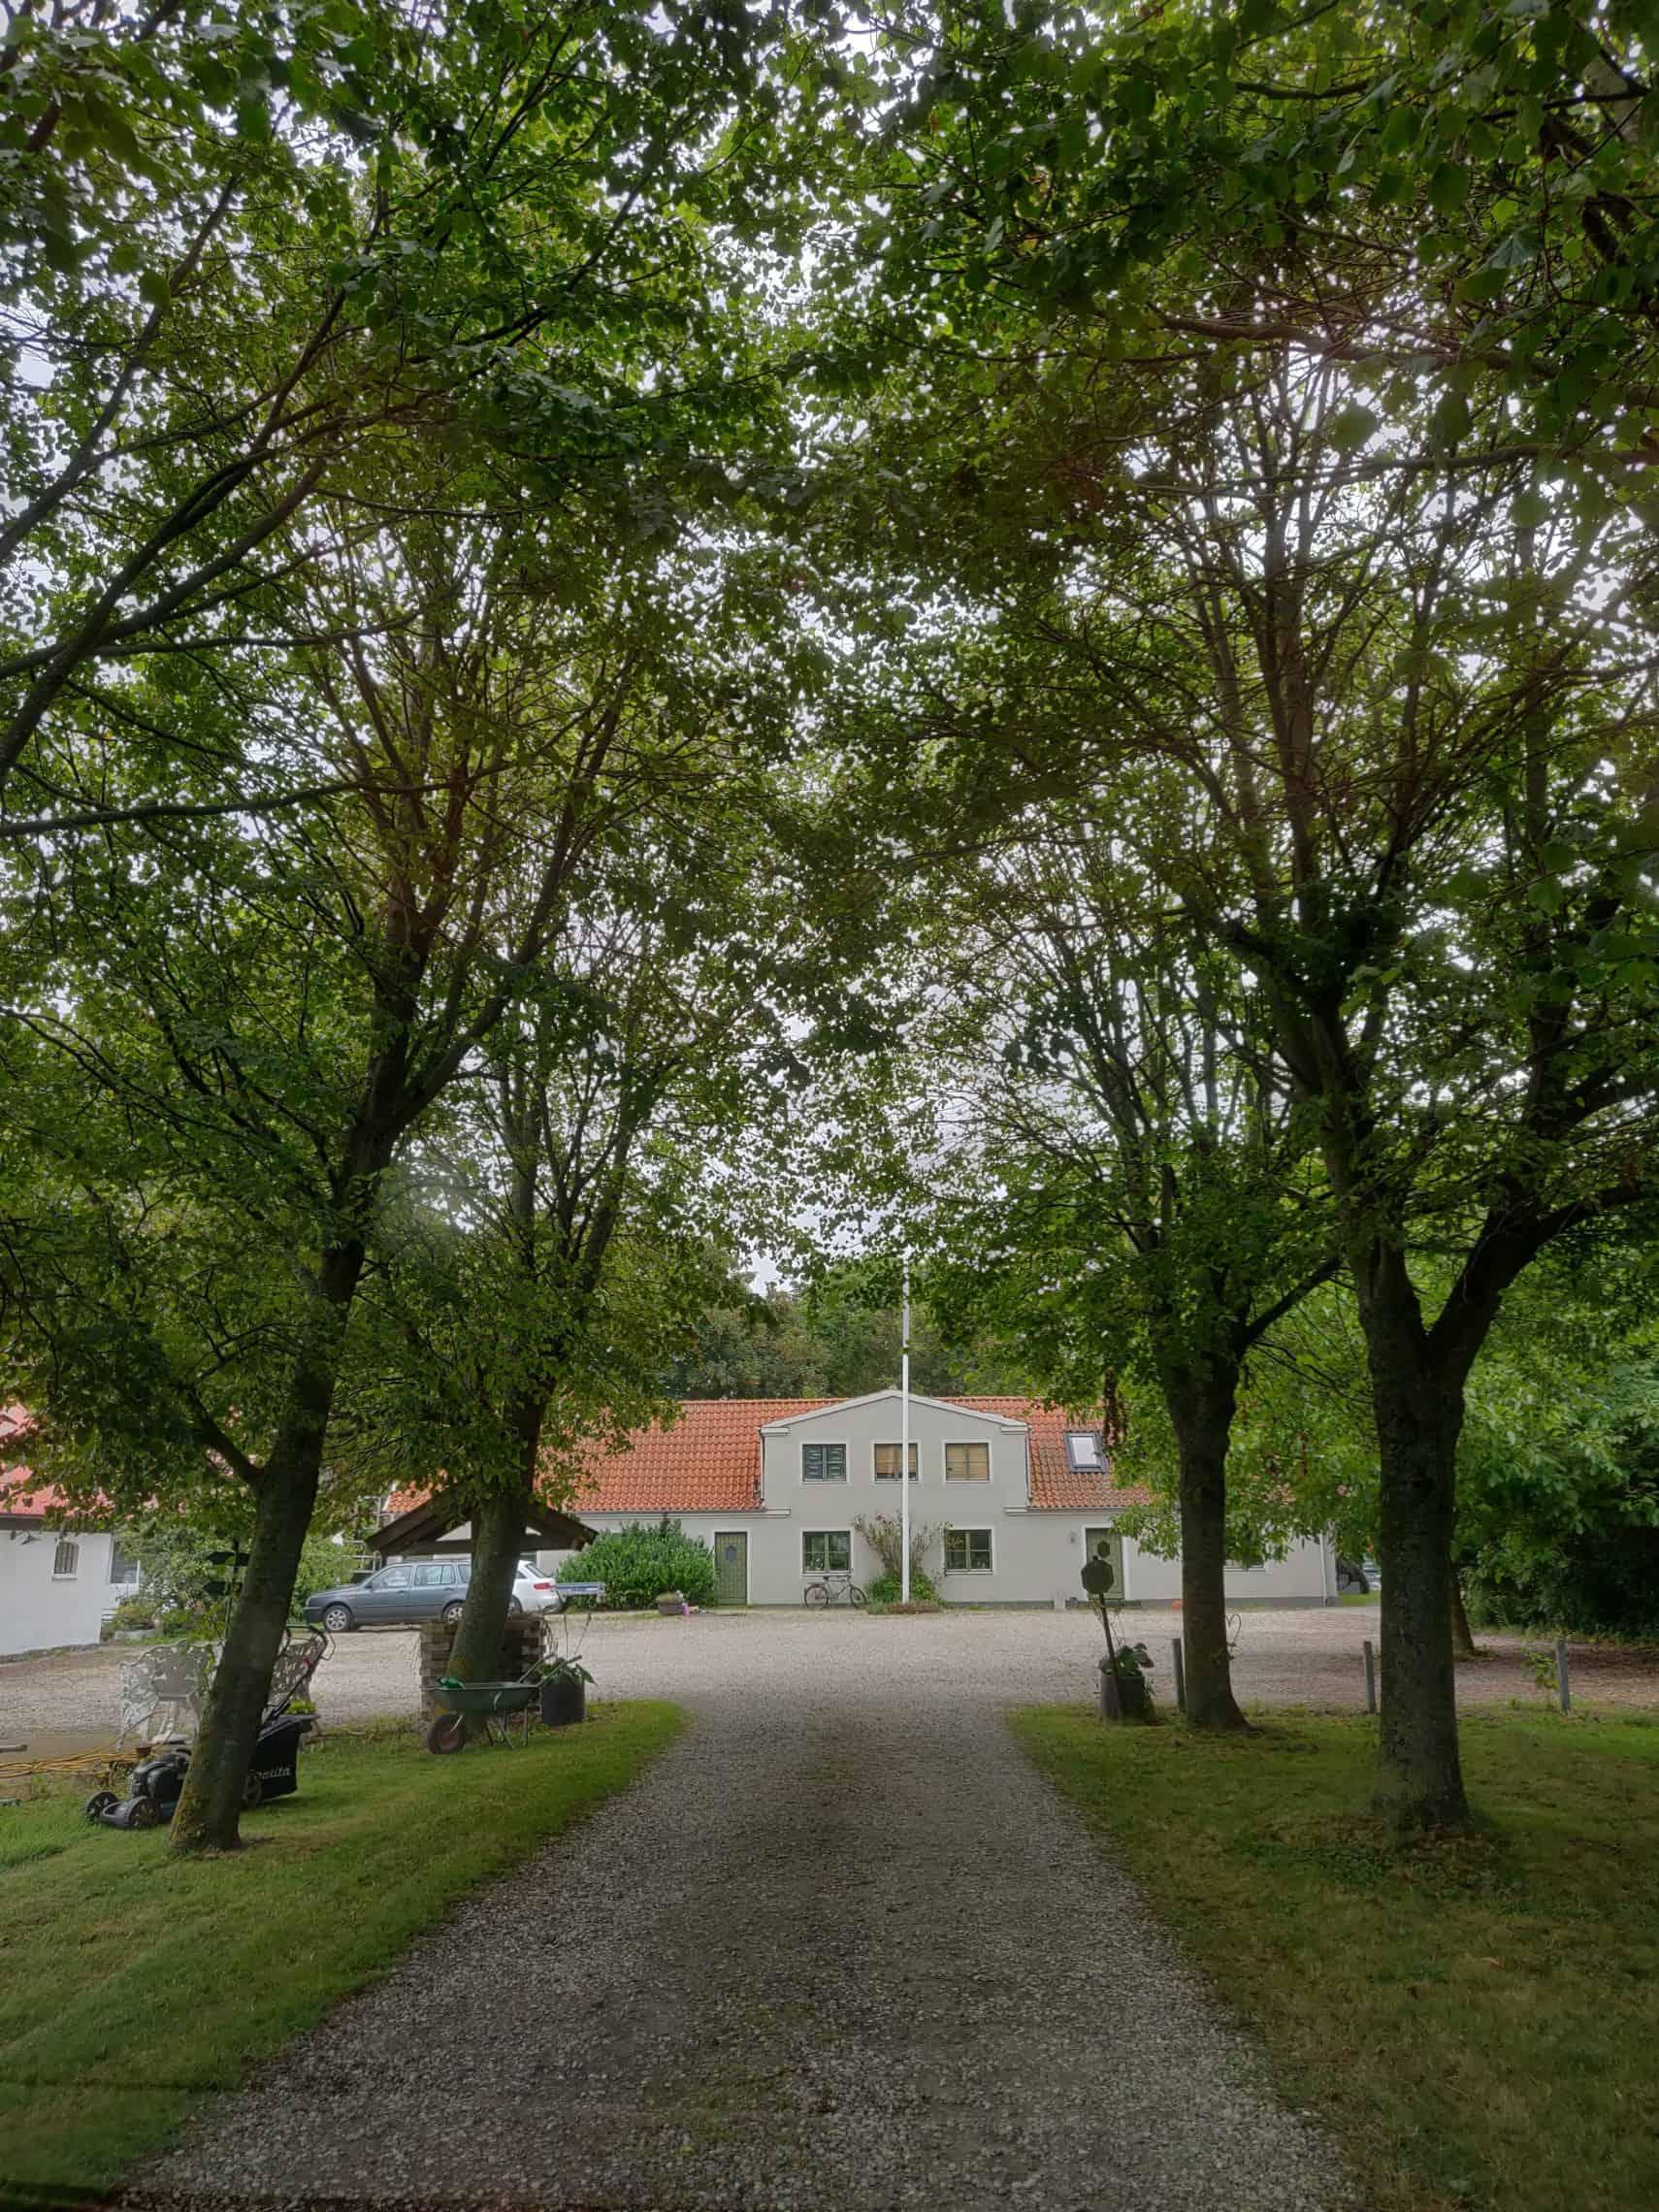 Matresa i södra Sverige 33